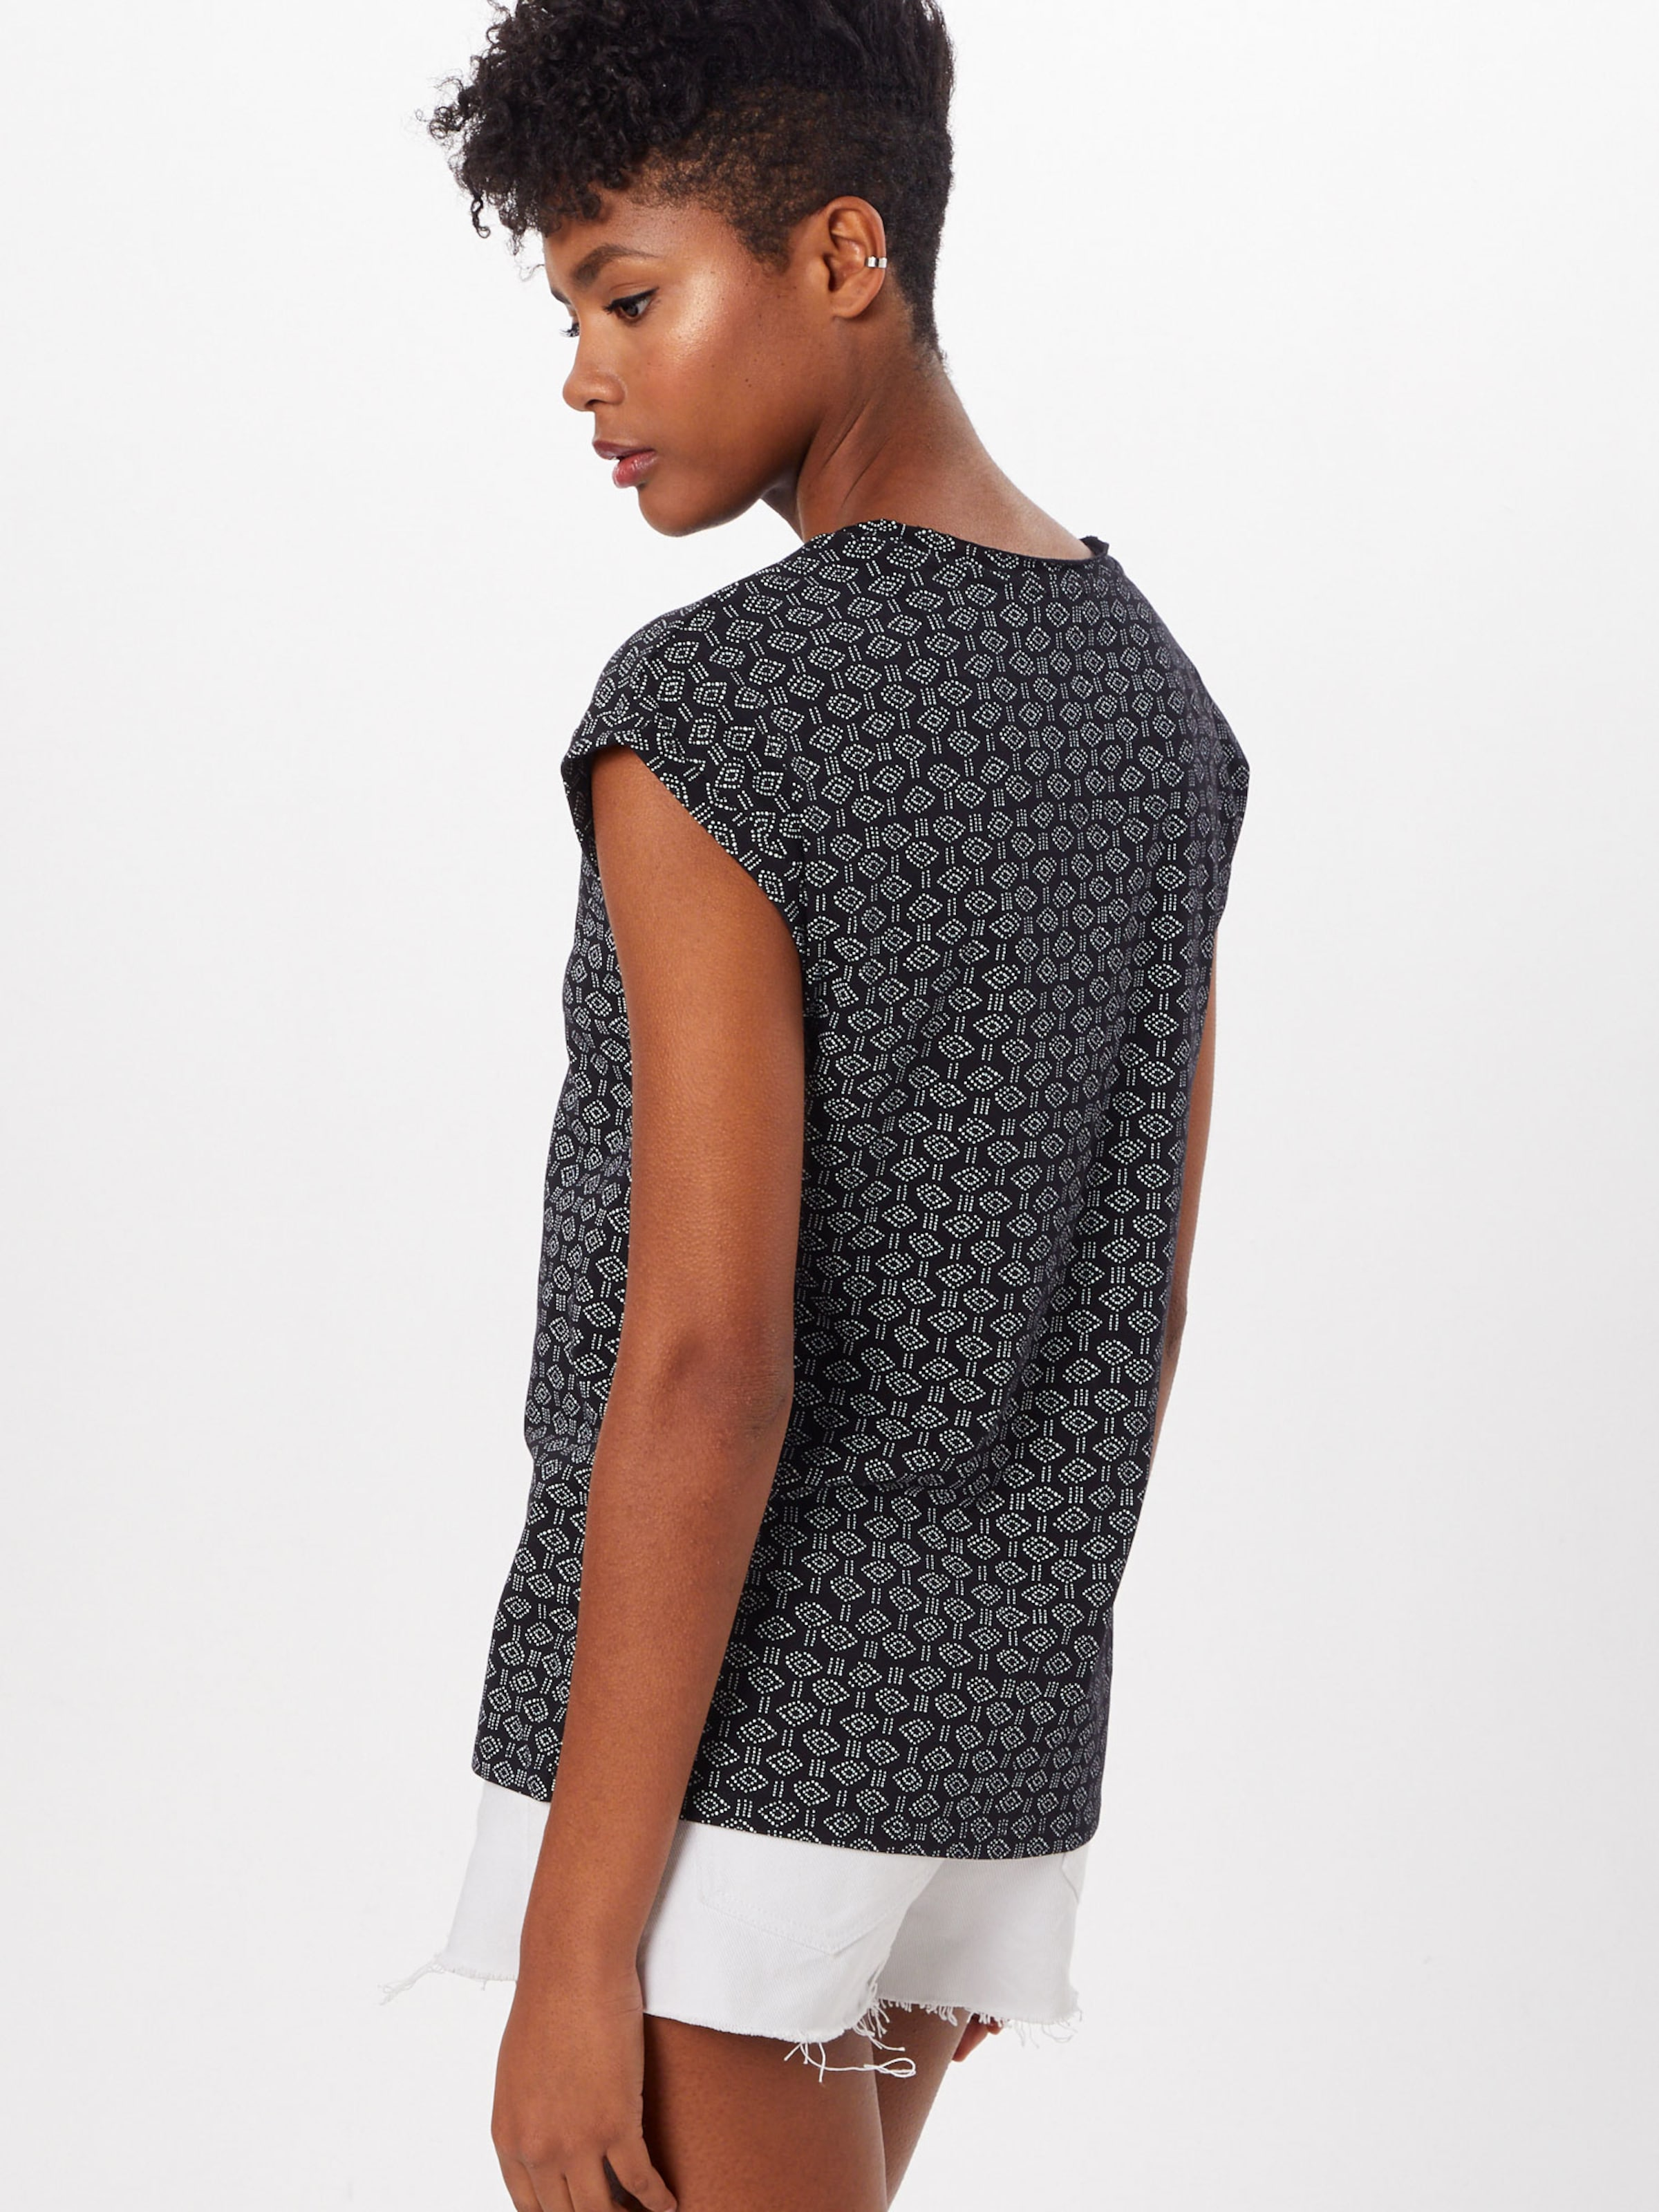 Esprit T shirt Tee' En Aw D'or Jaune 'pattern PNXw8kn0O